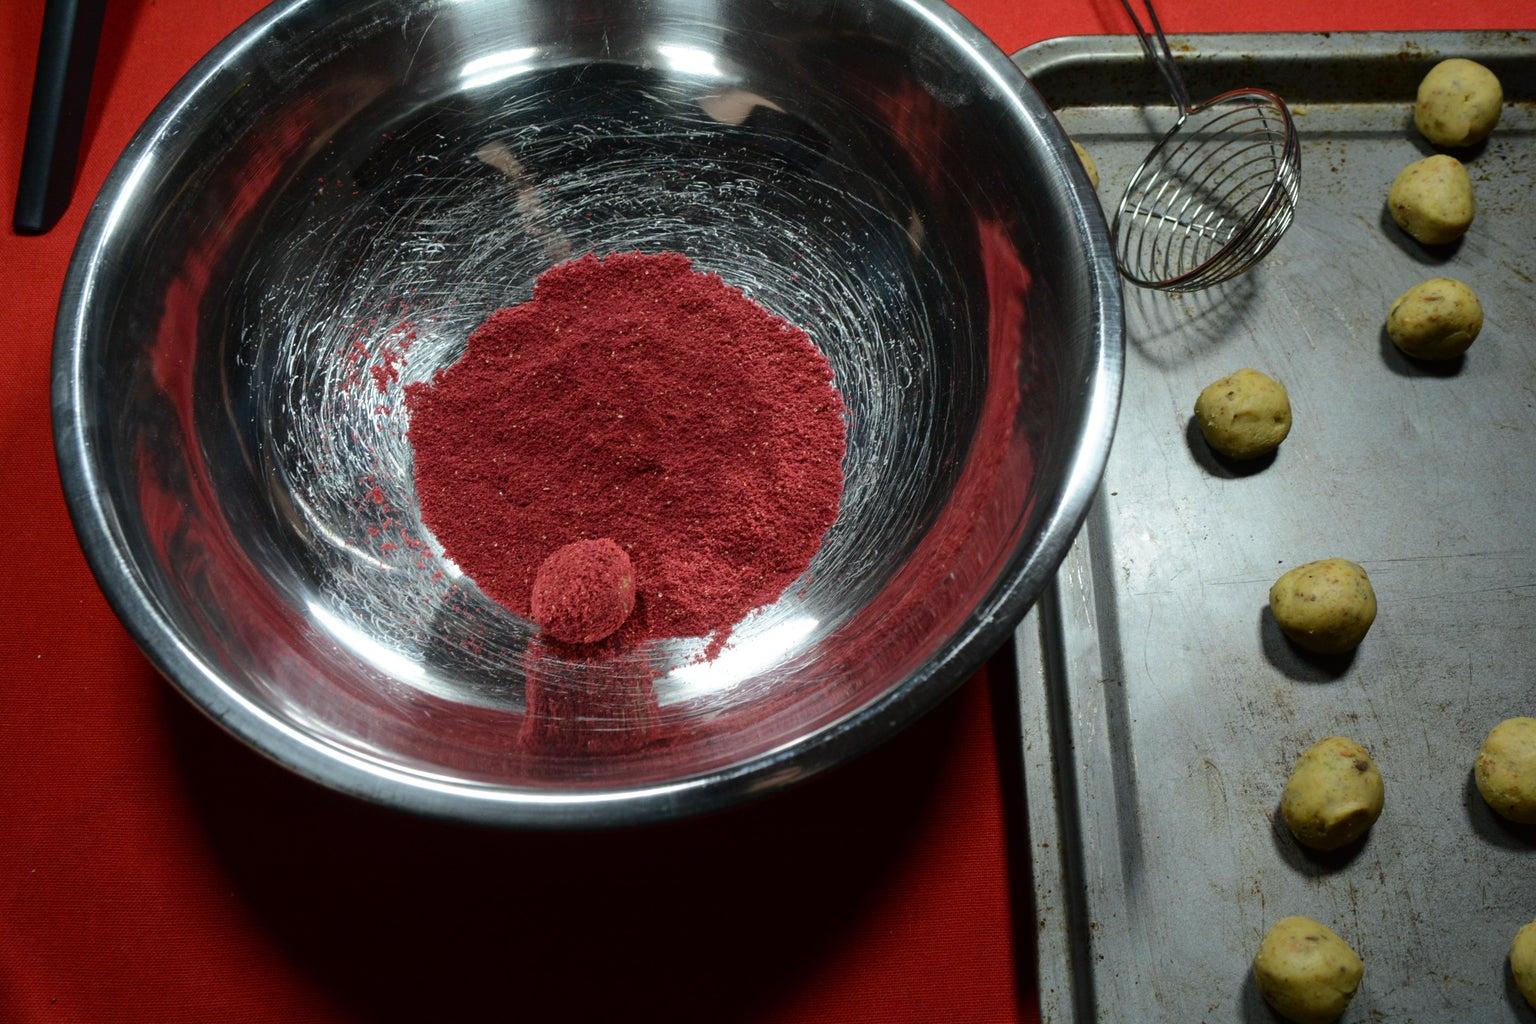 Roll Truffles in Raspberry Powder